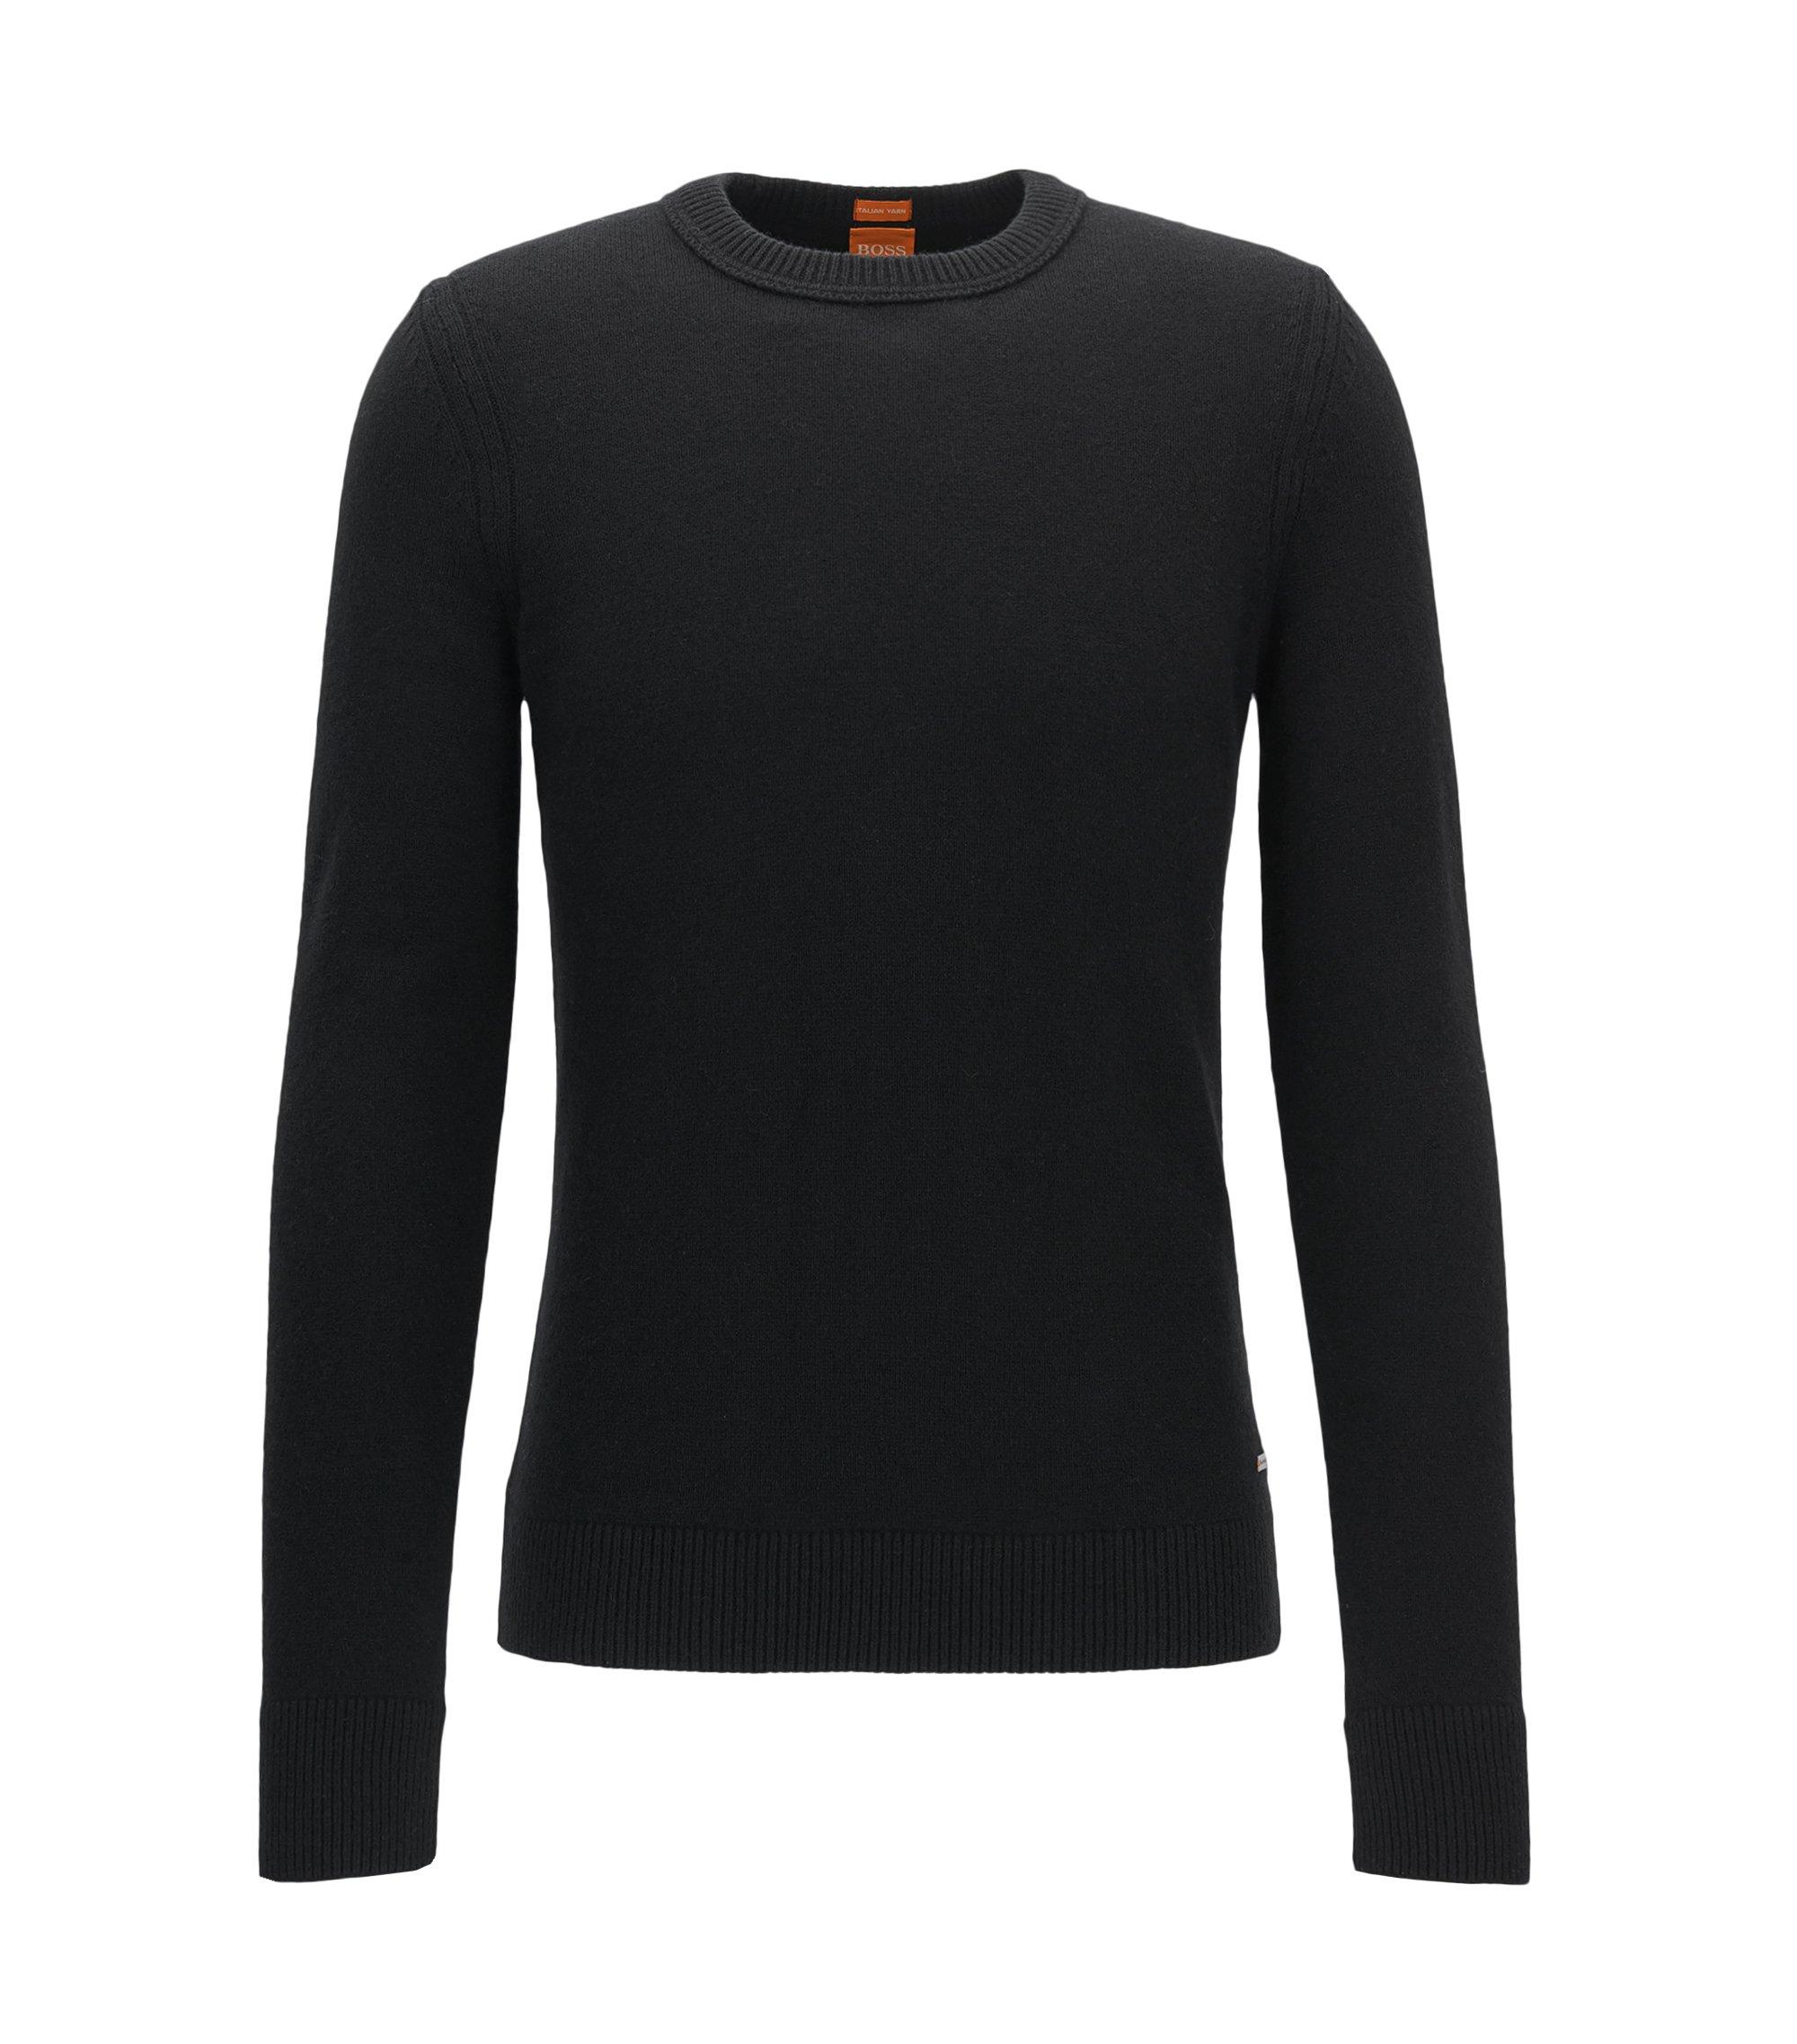 Crew-neck sweater in Italian yarn, Black